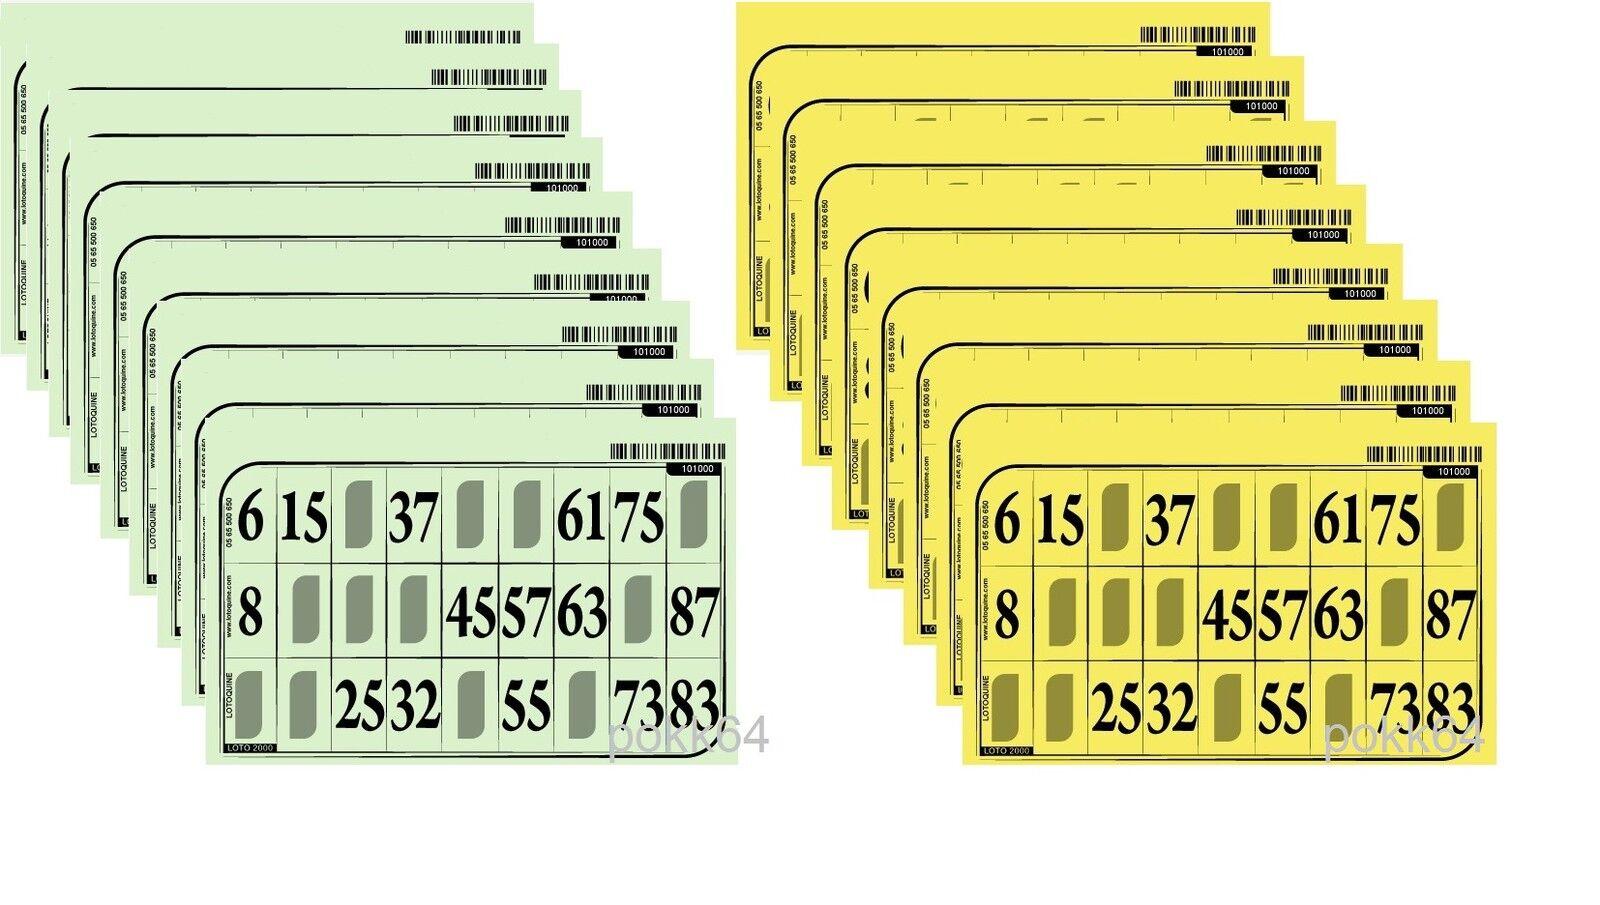 1000 autotoni de Lotto RIGIDE Grilles toutes diff;noleggio targhe